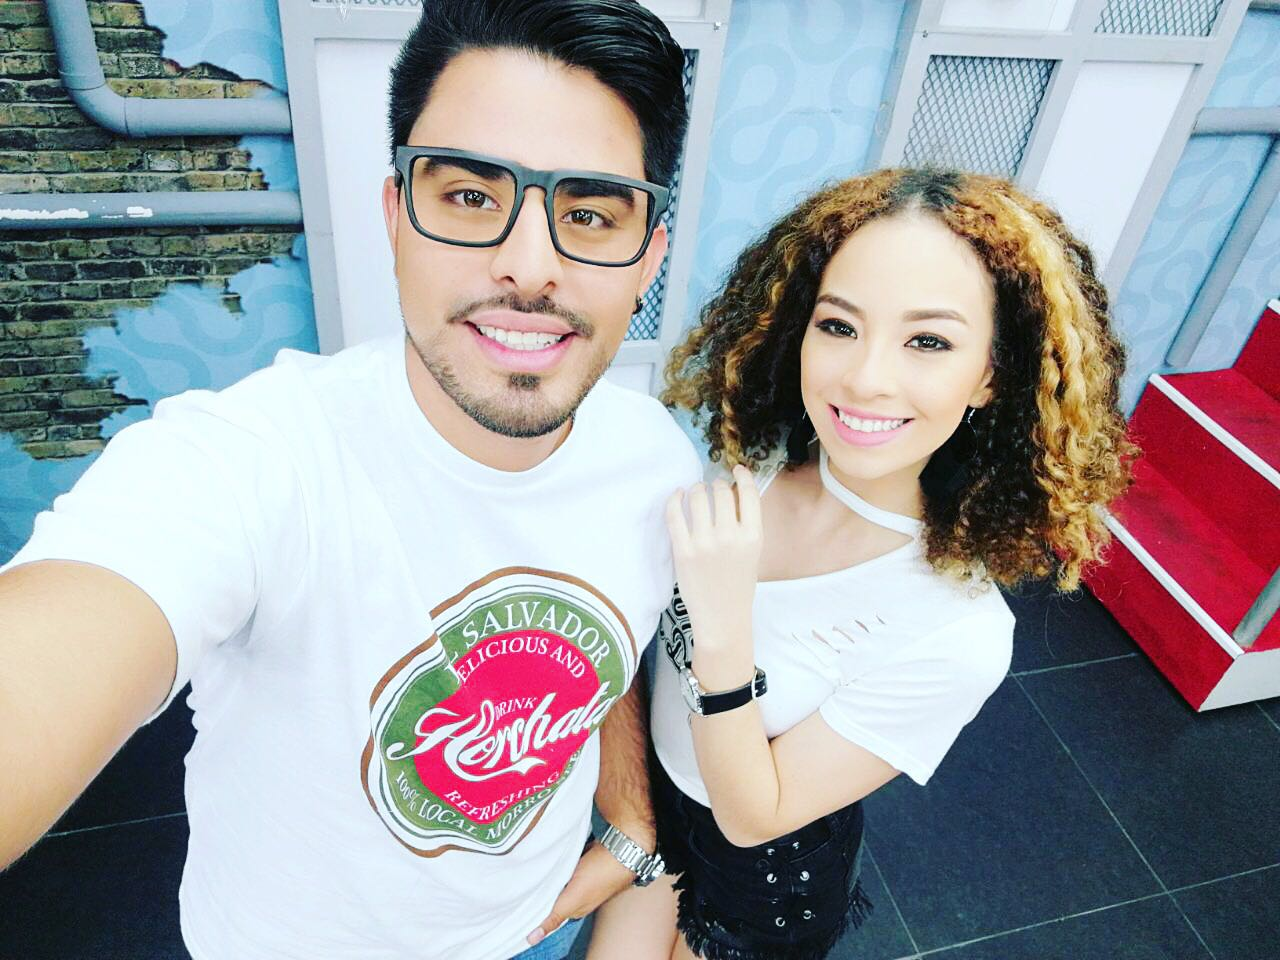 Camiseta Horchata El Salvador